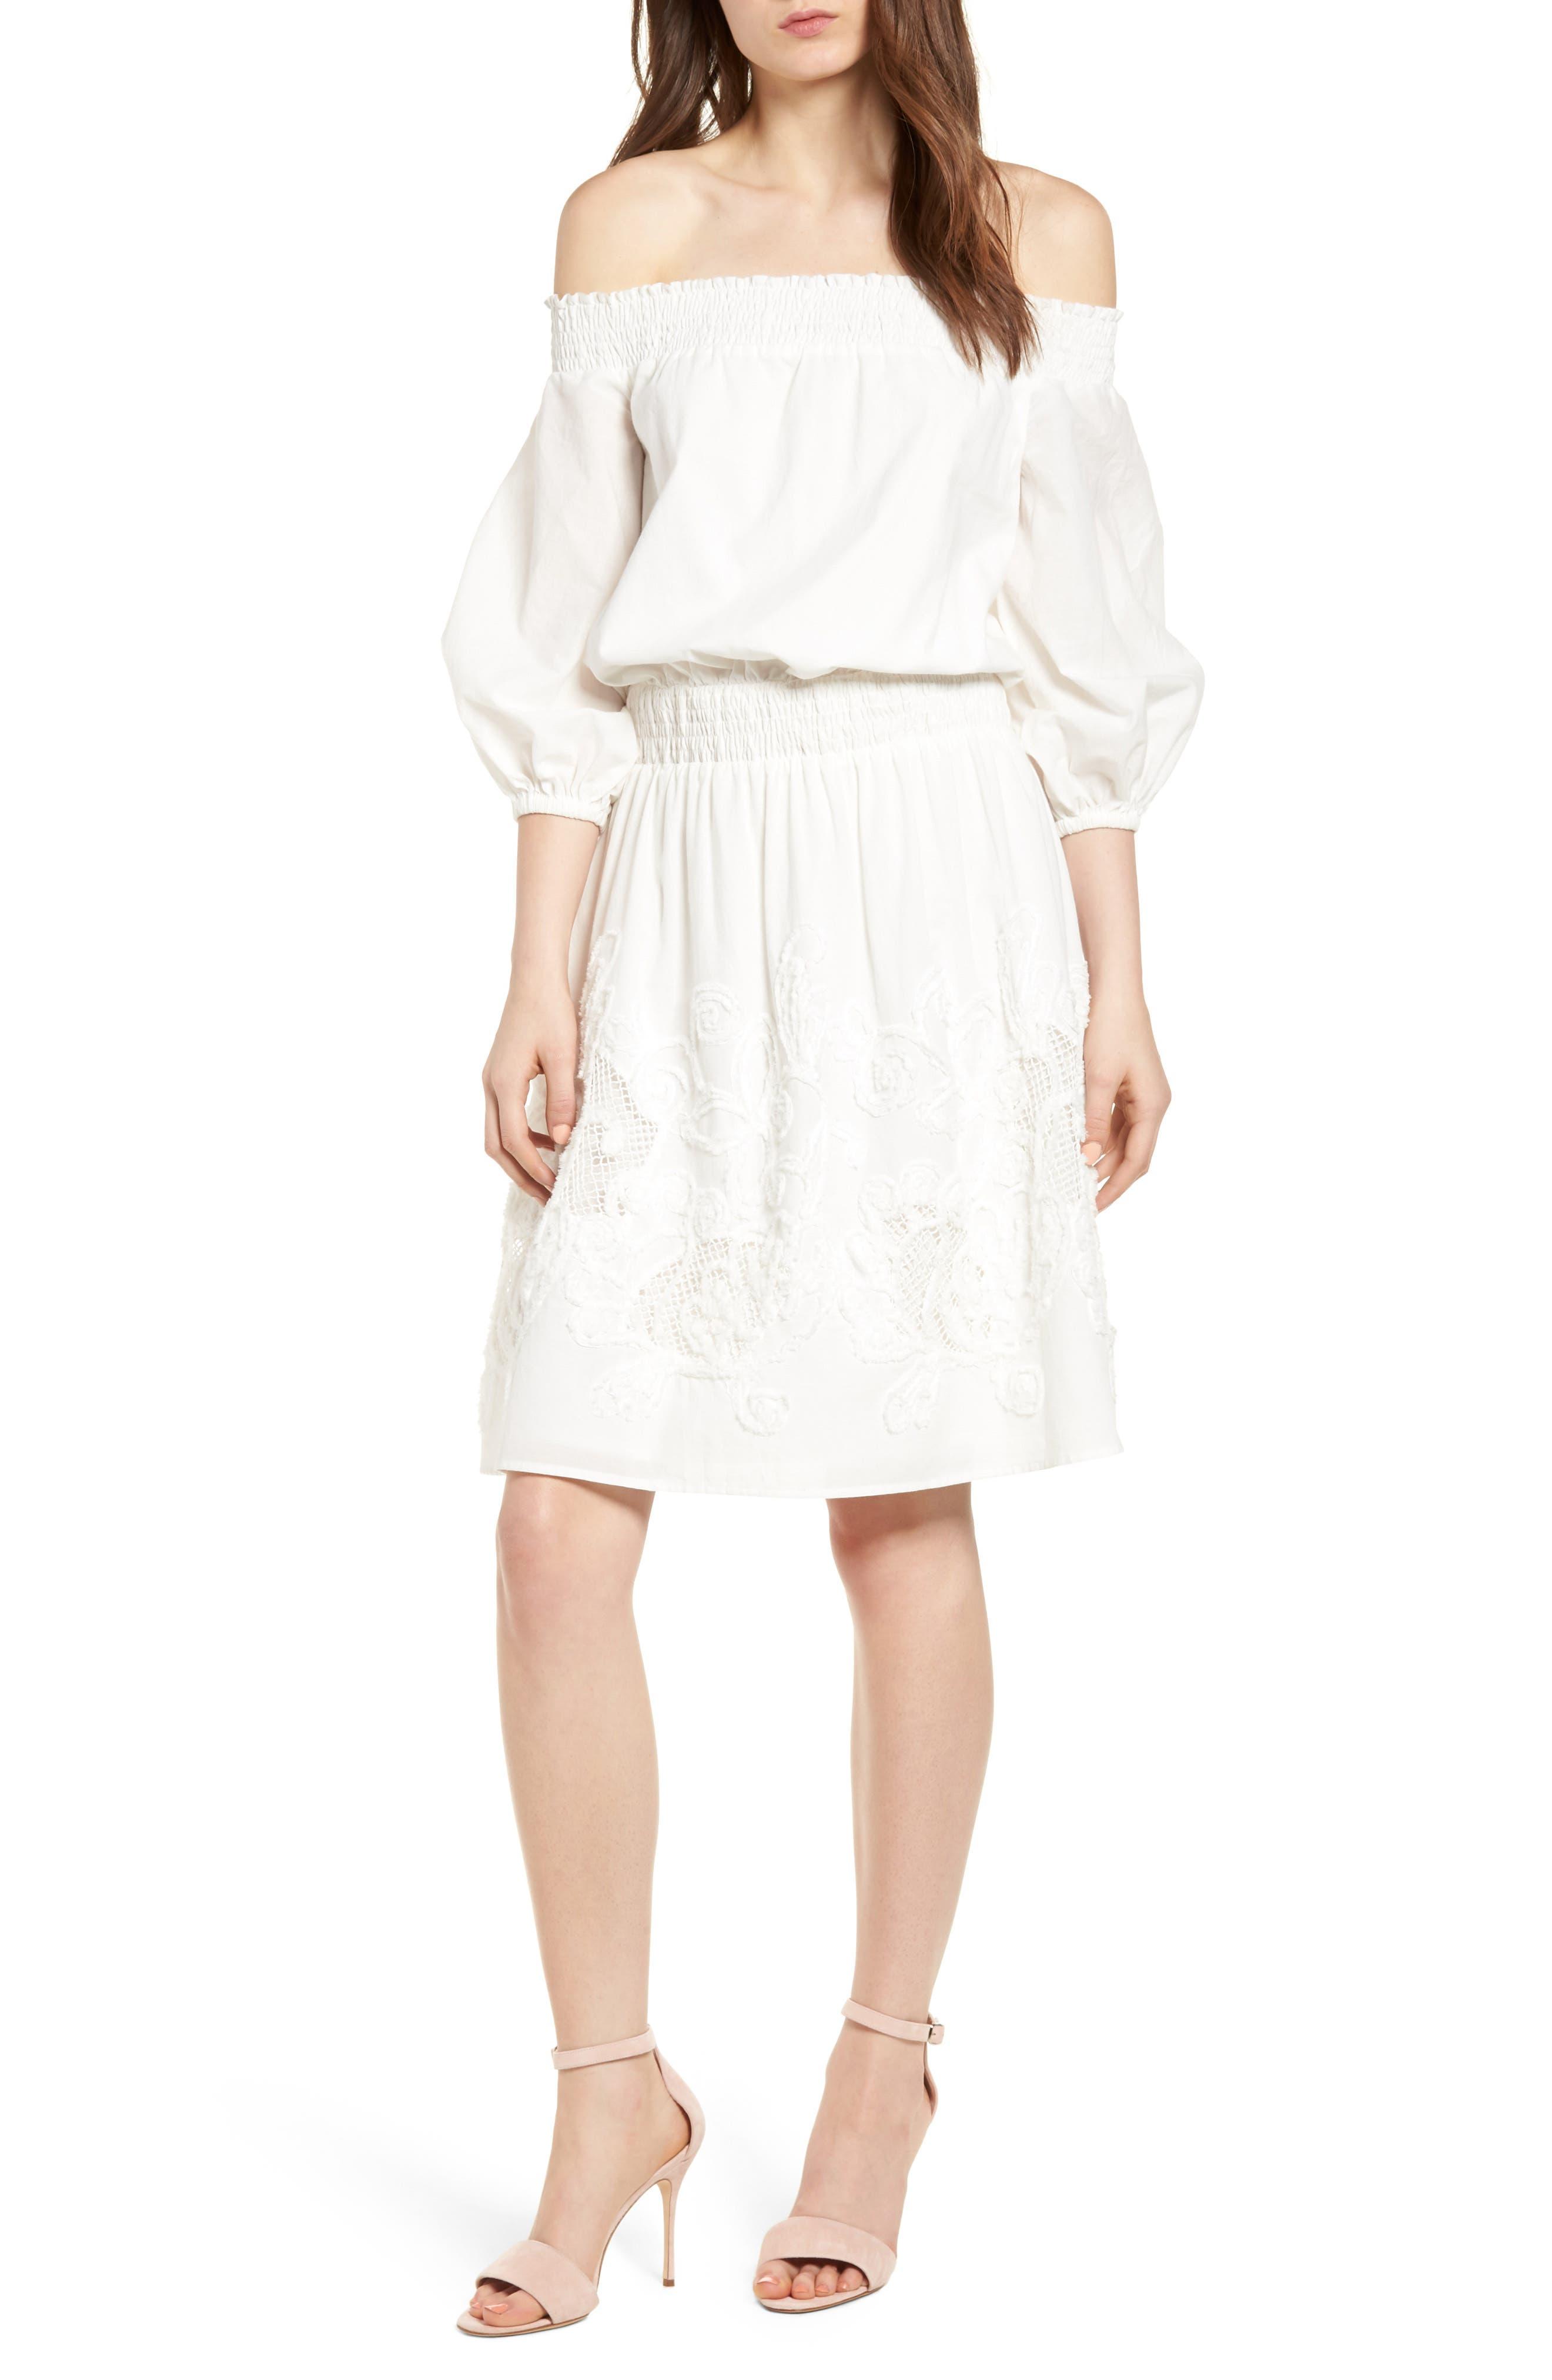 Chelsea28 Embroidered Off the Shoulder Blouson Dress (Regular & Petite)